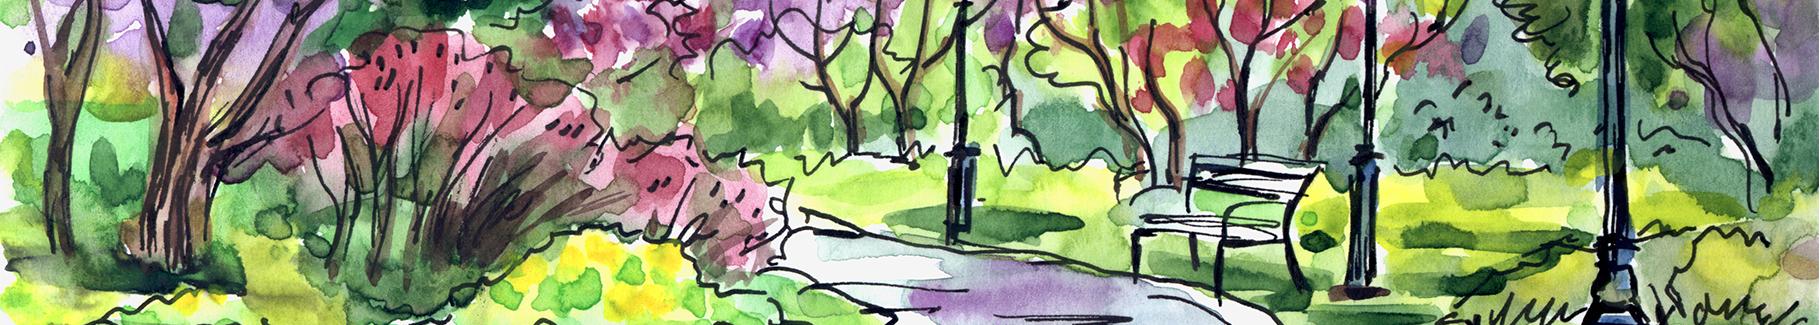 Obraz park malowany akwarelą